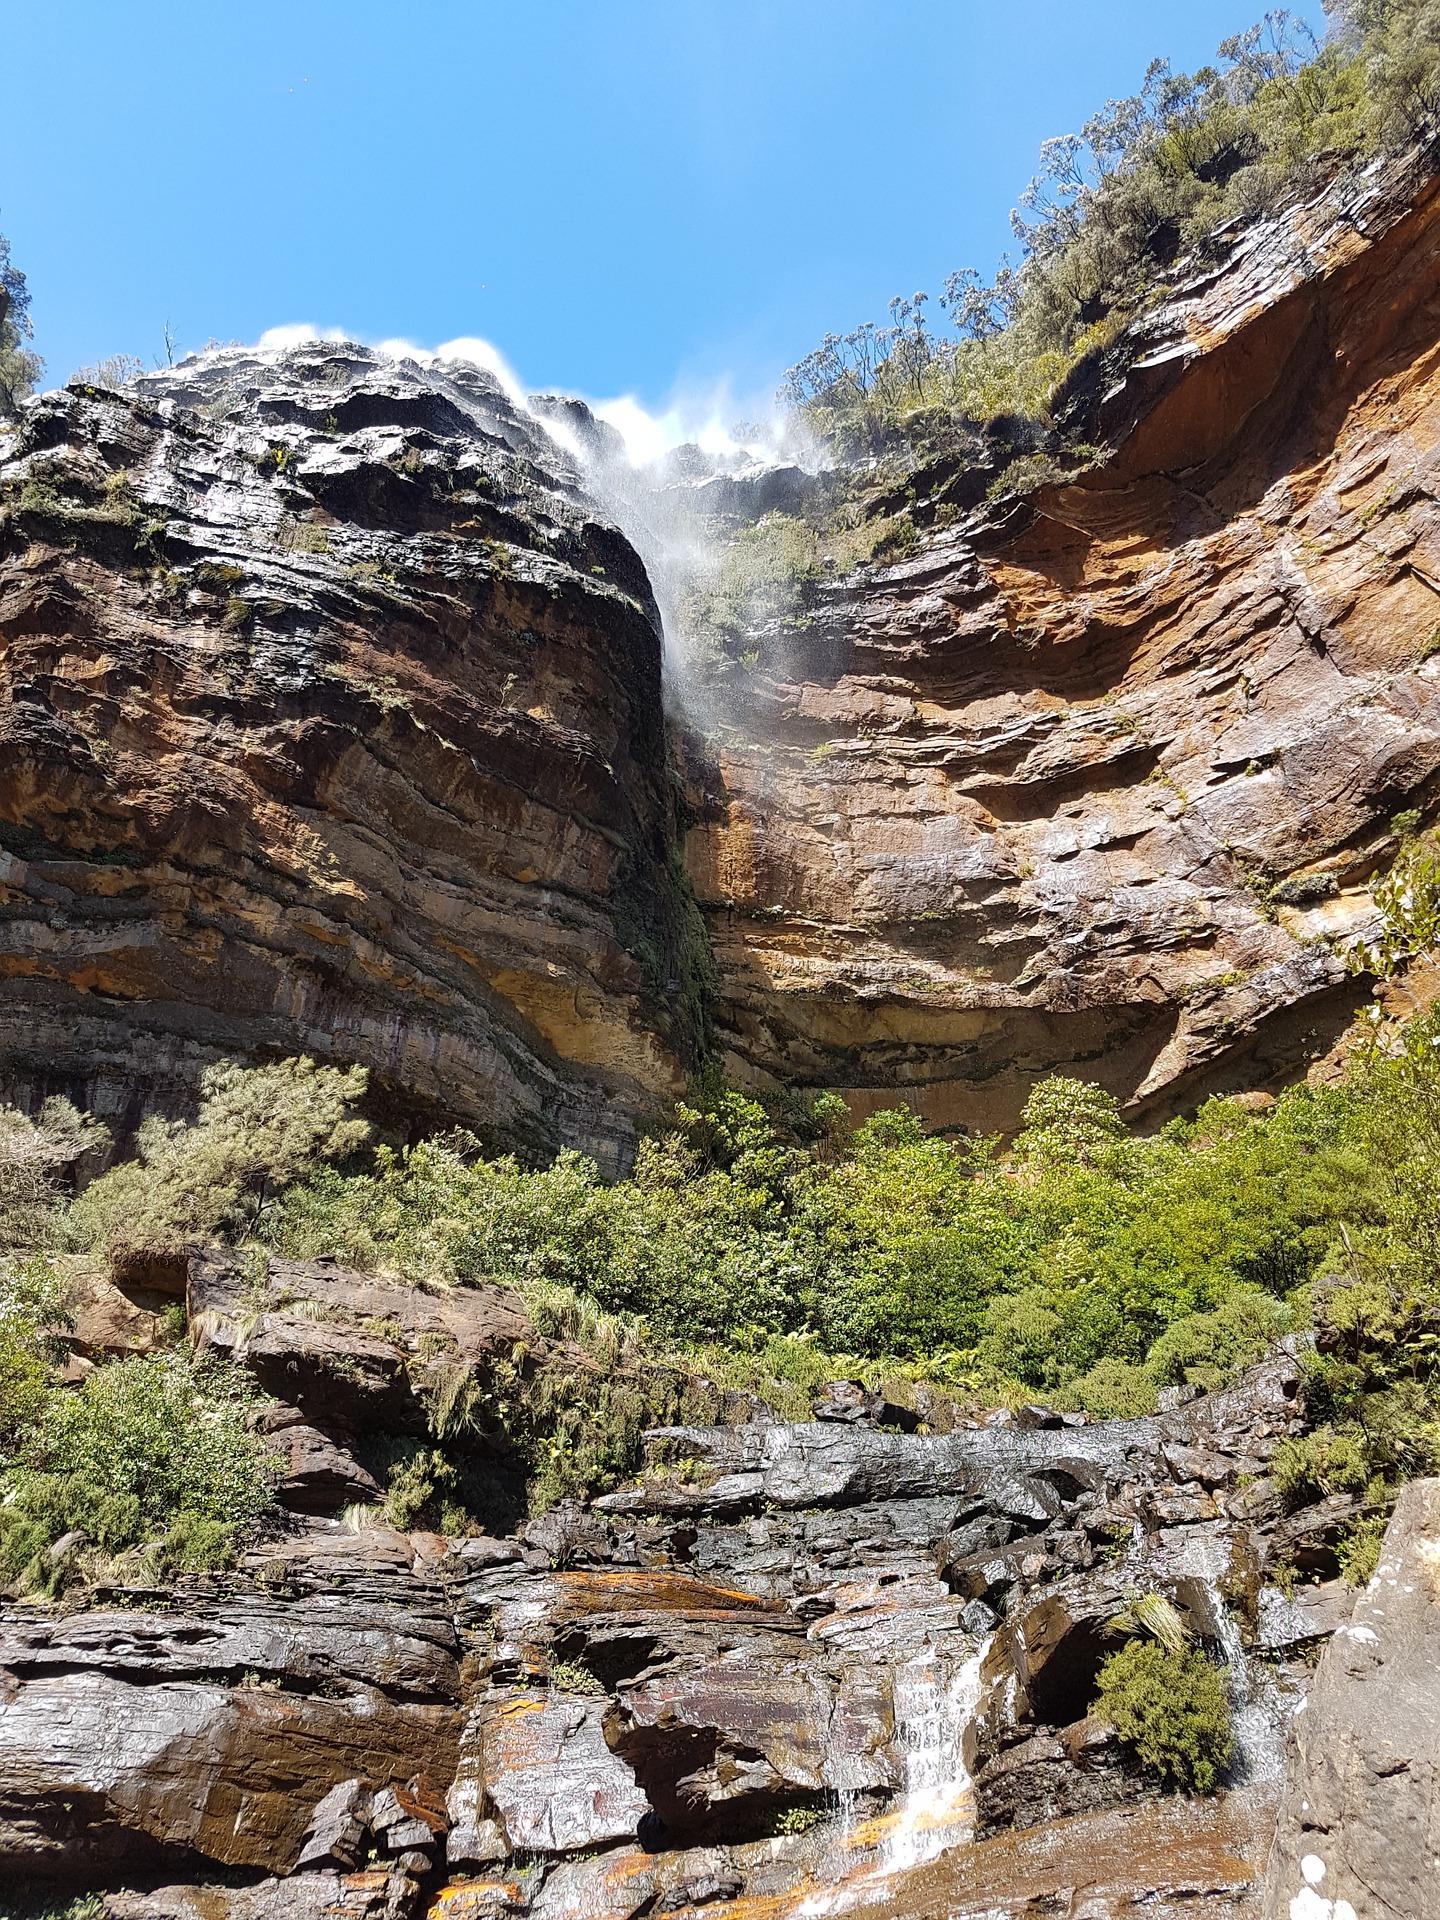 the lake and waterfall